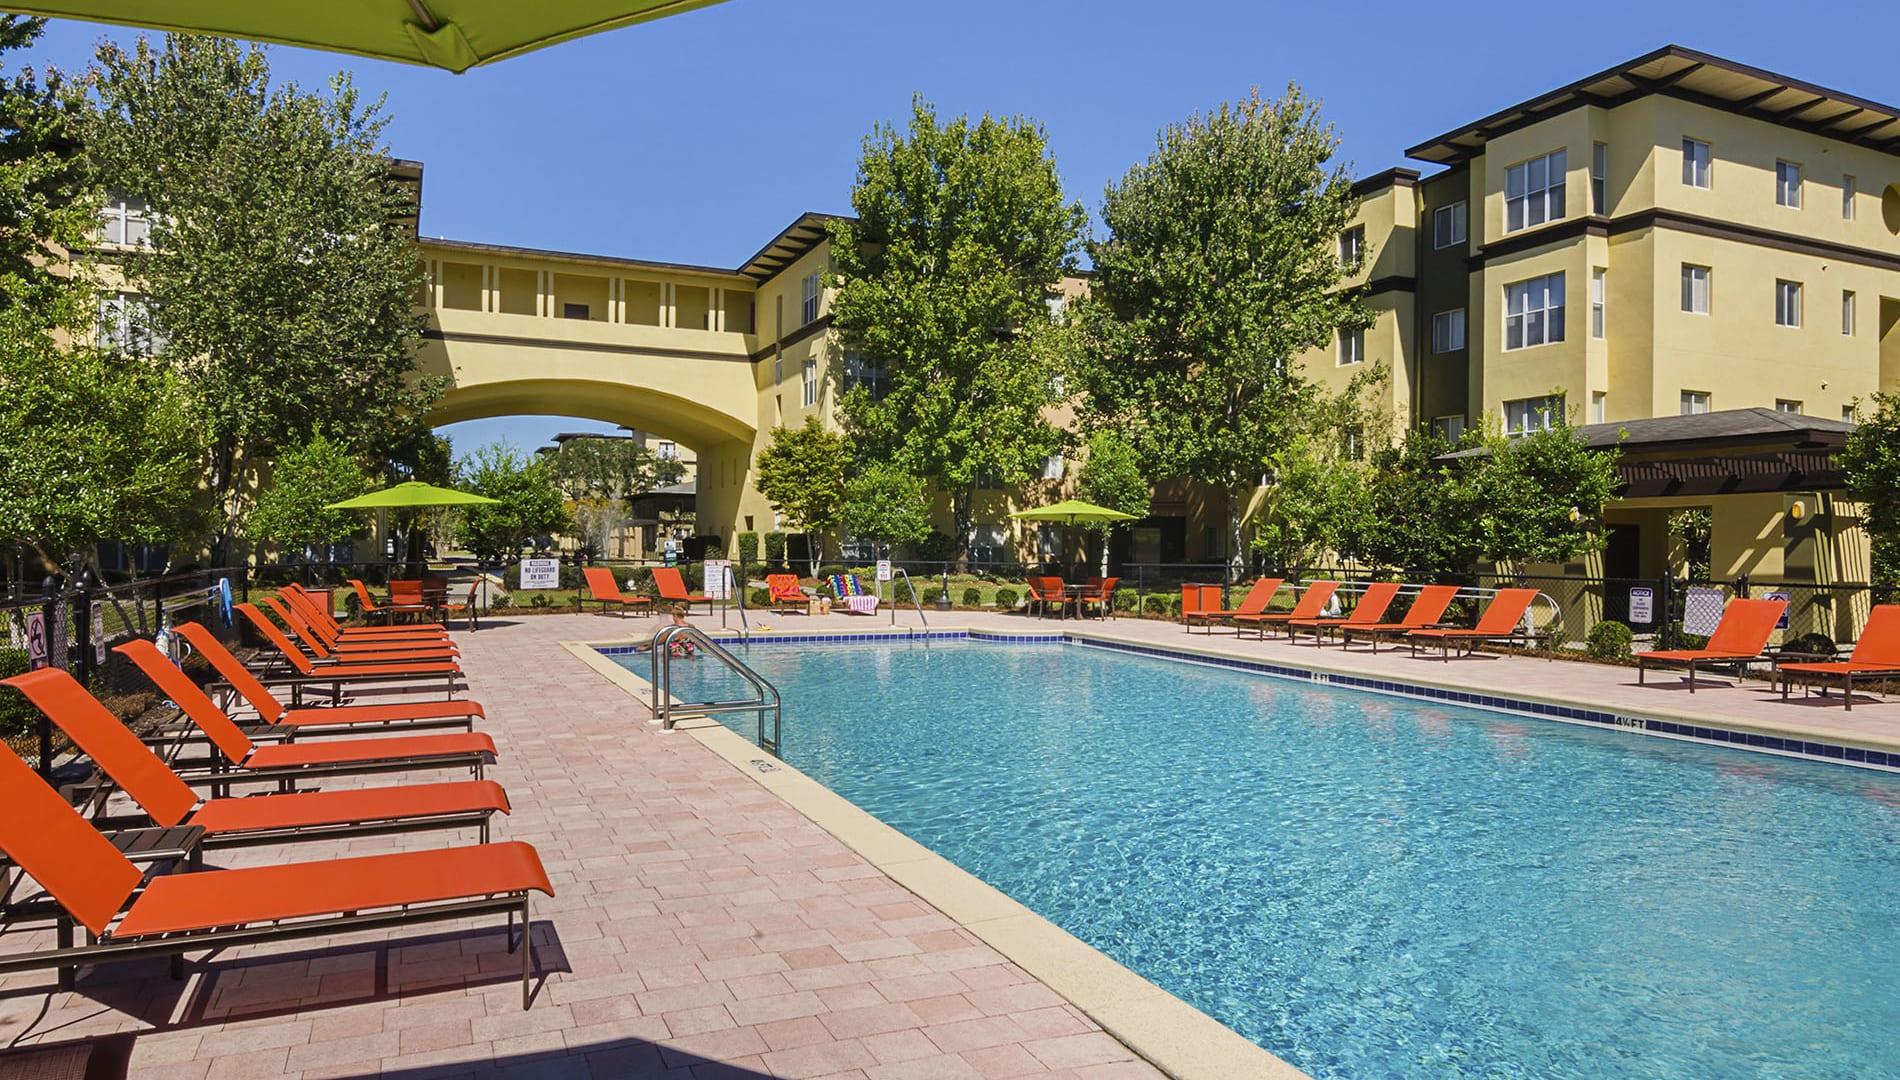 Poolside View at Chez Elan Fine Apartment Homes in Fort Walton Beach, Florida, FL